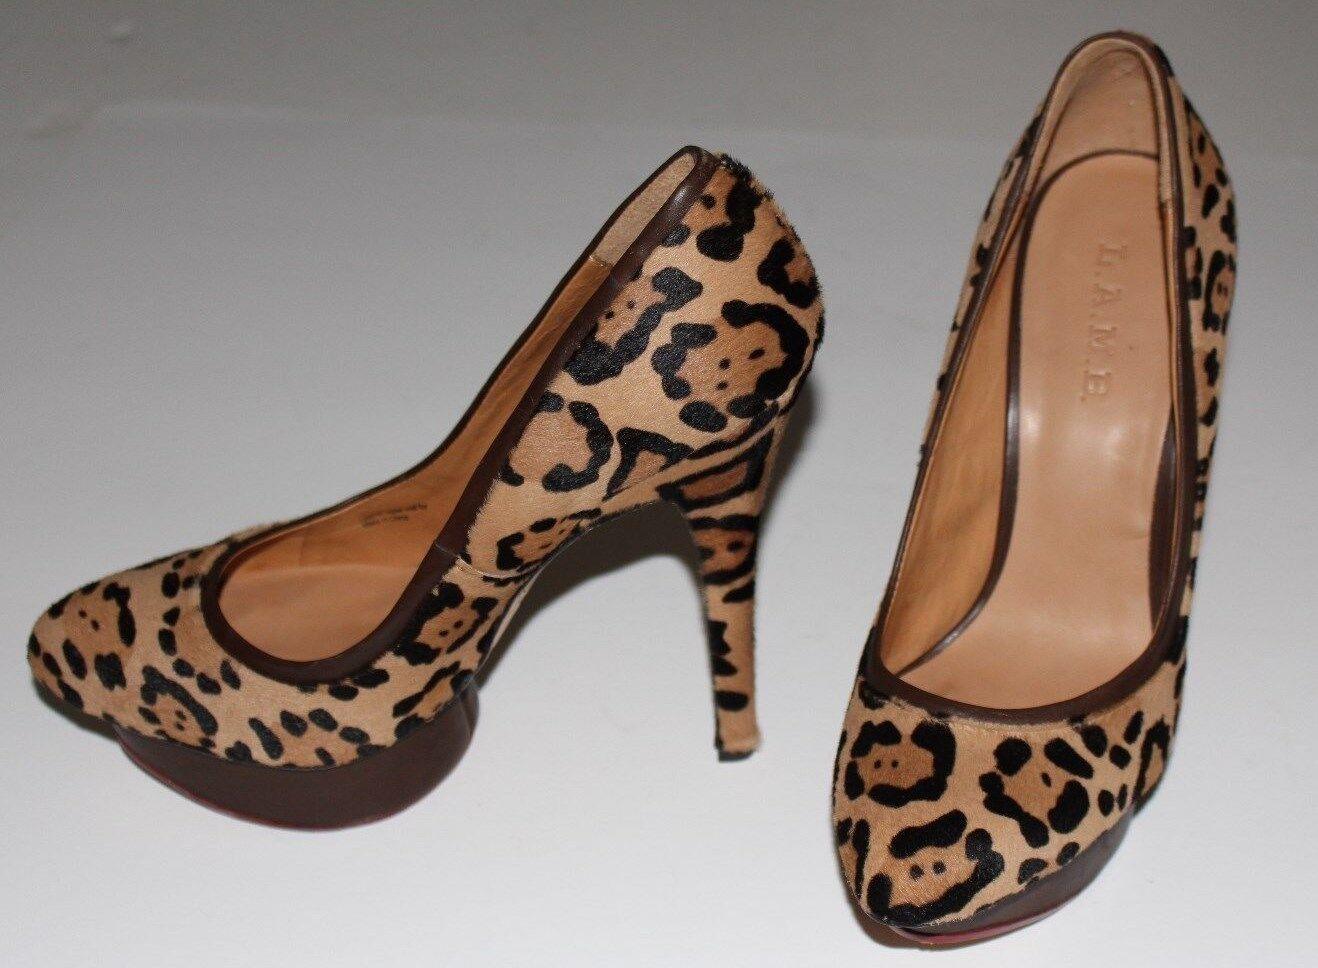 L.A.M.B.8.5 M Leopard Calf Hair Pumps braun Leather 1.25 1.25 1.25  Platform 5.5 Heel  325 2ebe97